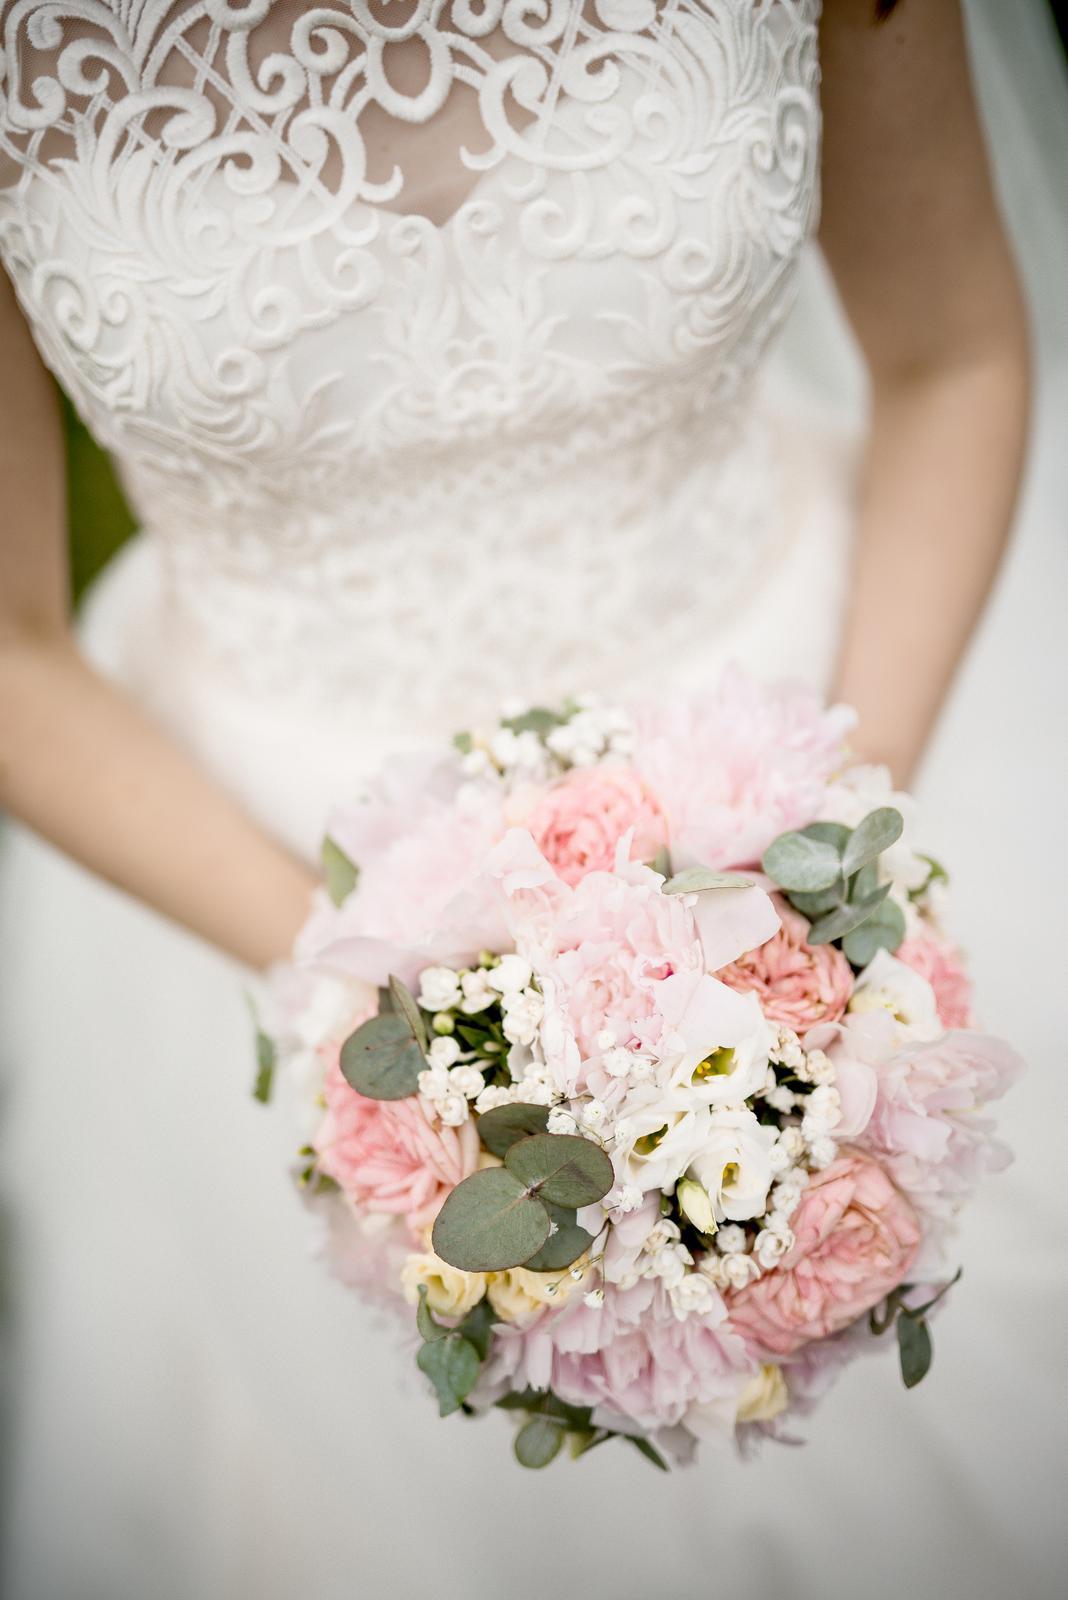 Jednoduché smotanové svadobné šaty - Obrázok č. 3